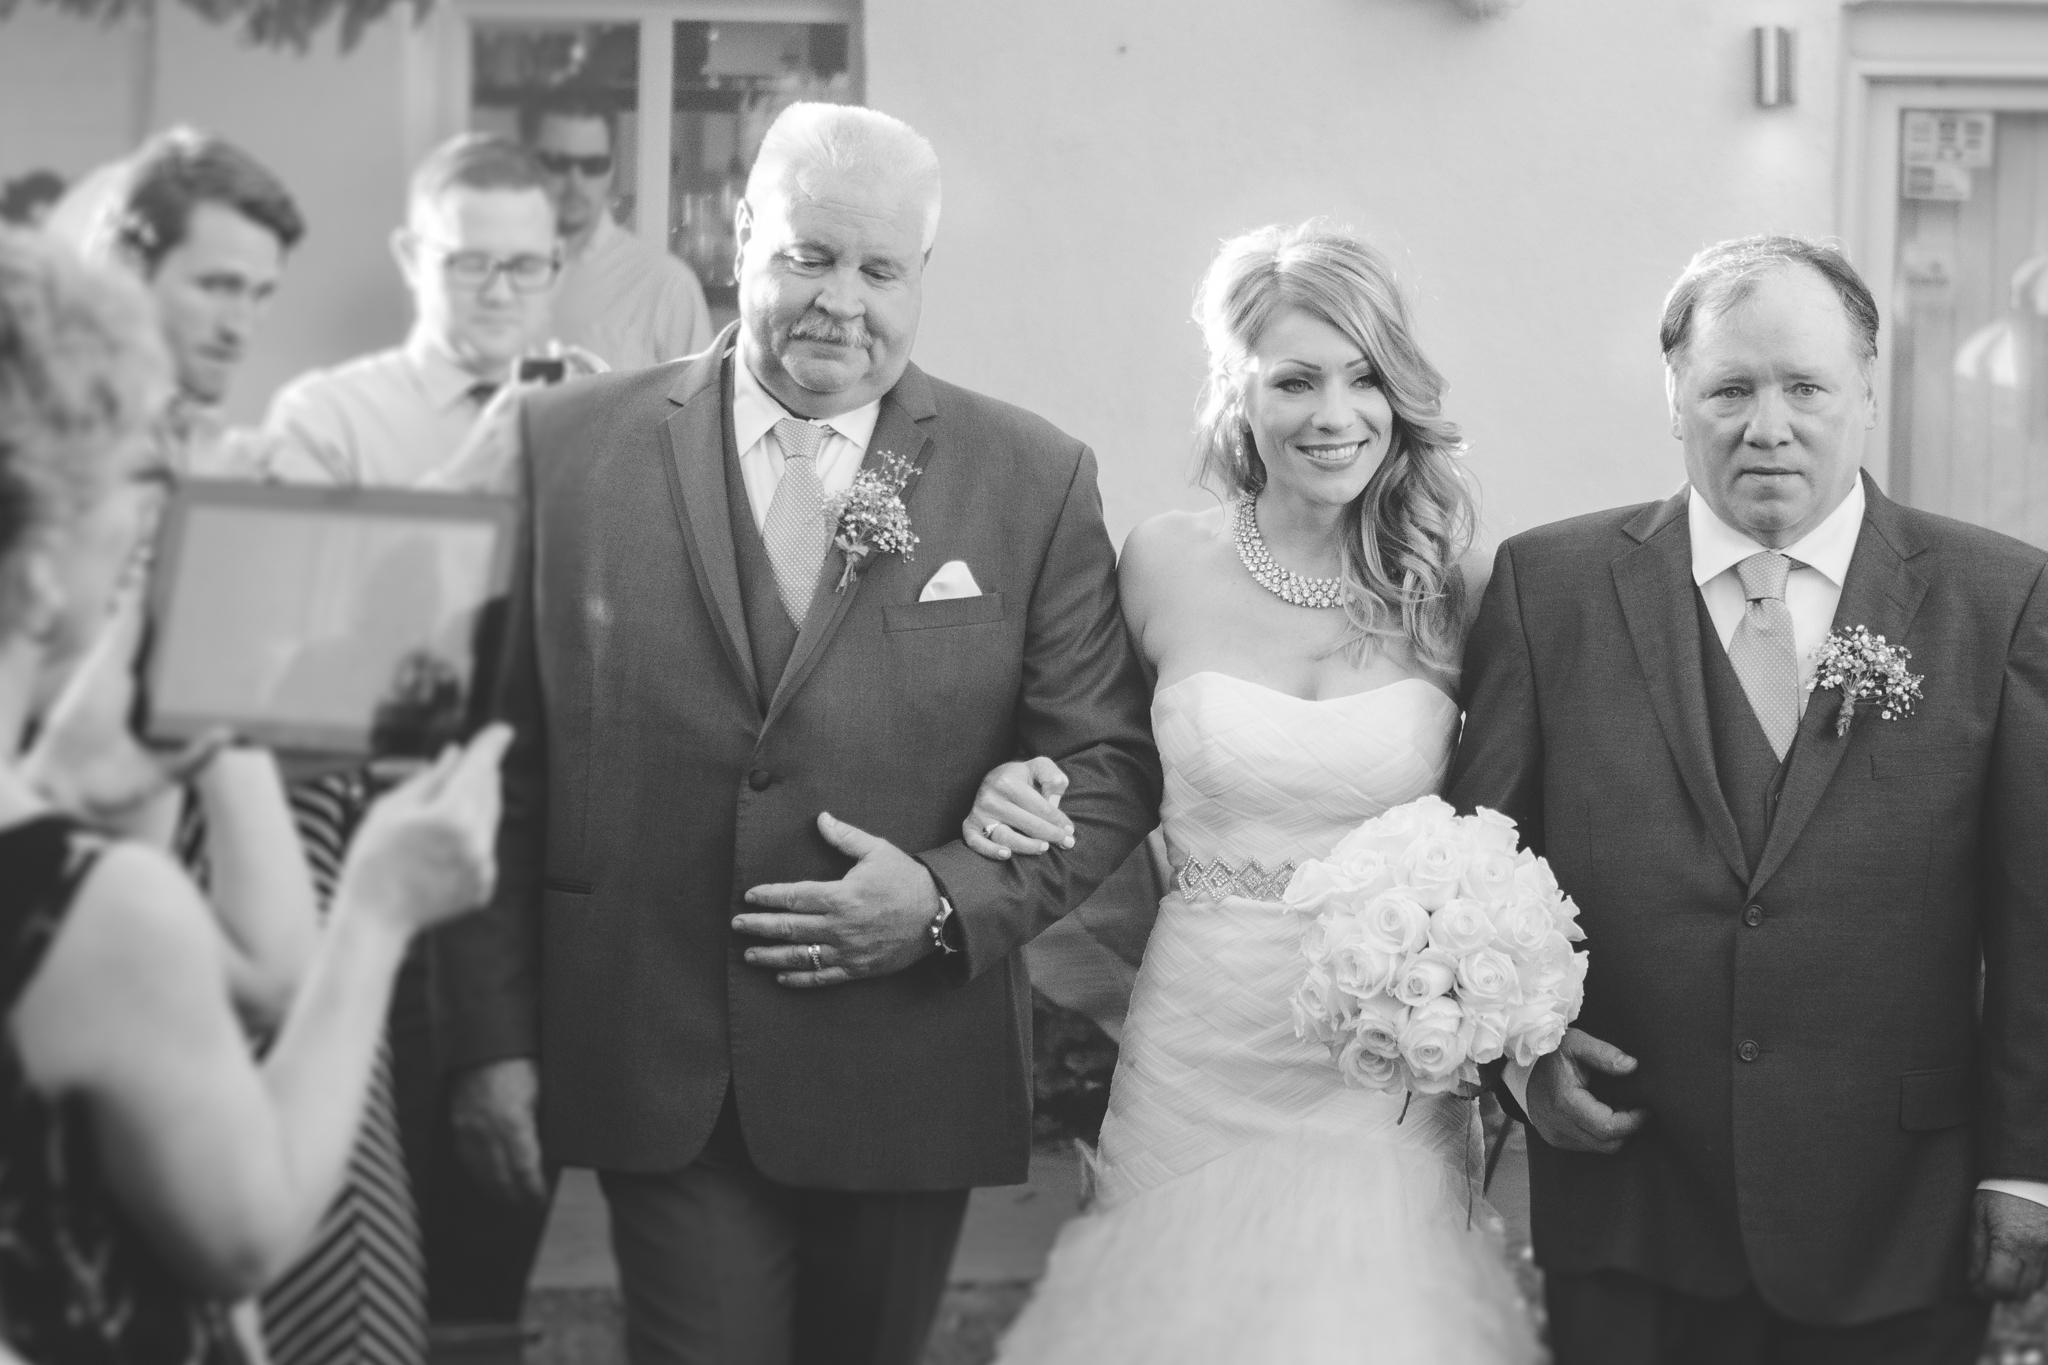 scottsdale=wedding-photographer--el-dorado-bride-walking-aisle